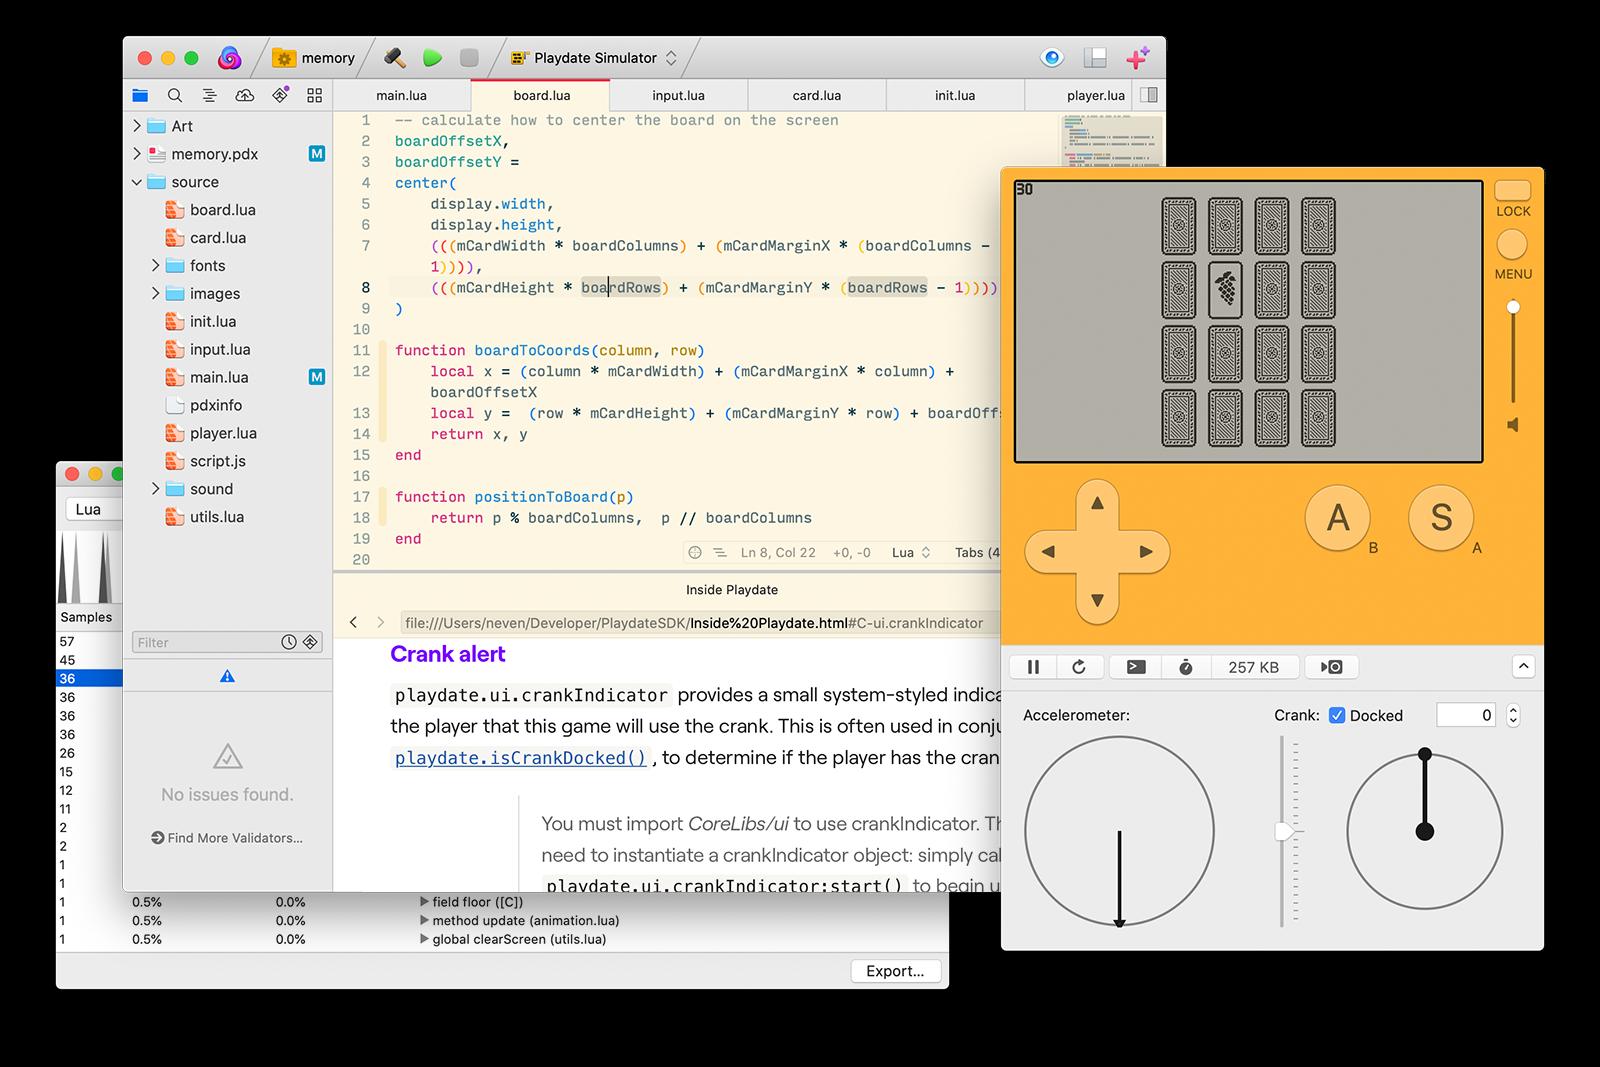 The Playdate software development kit